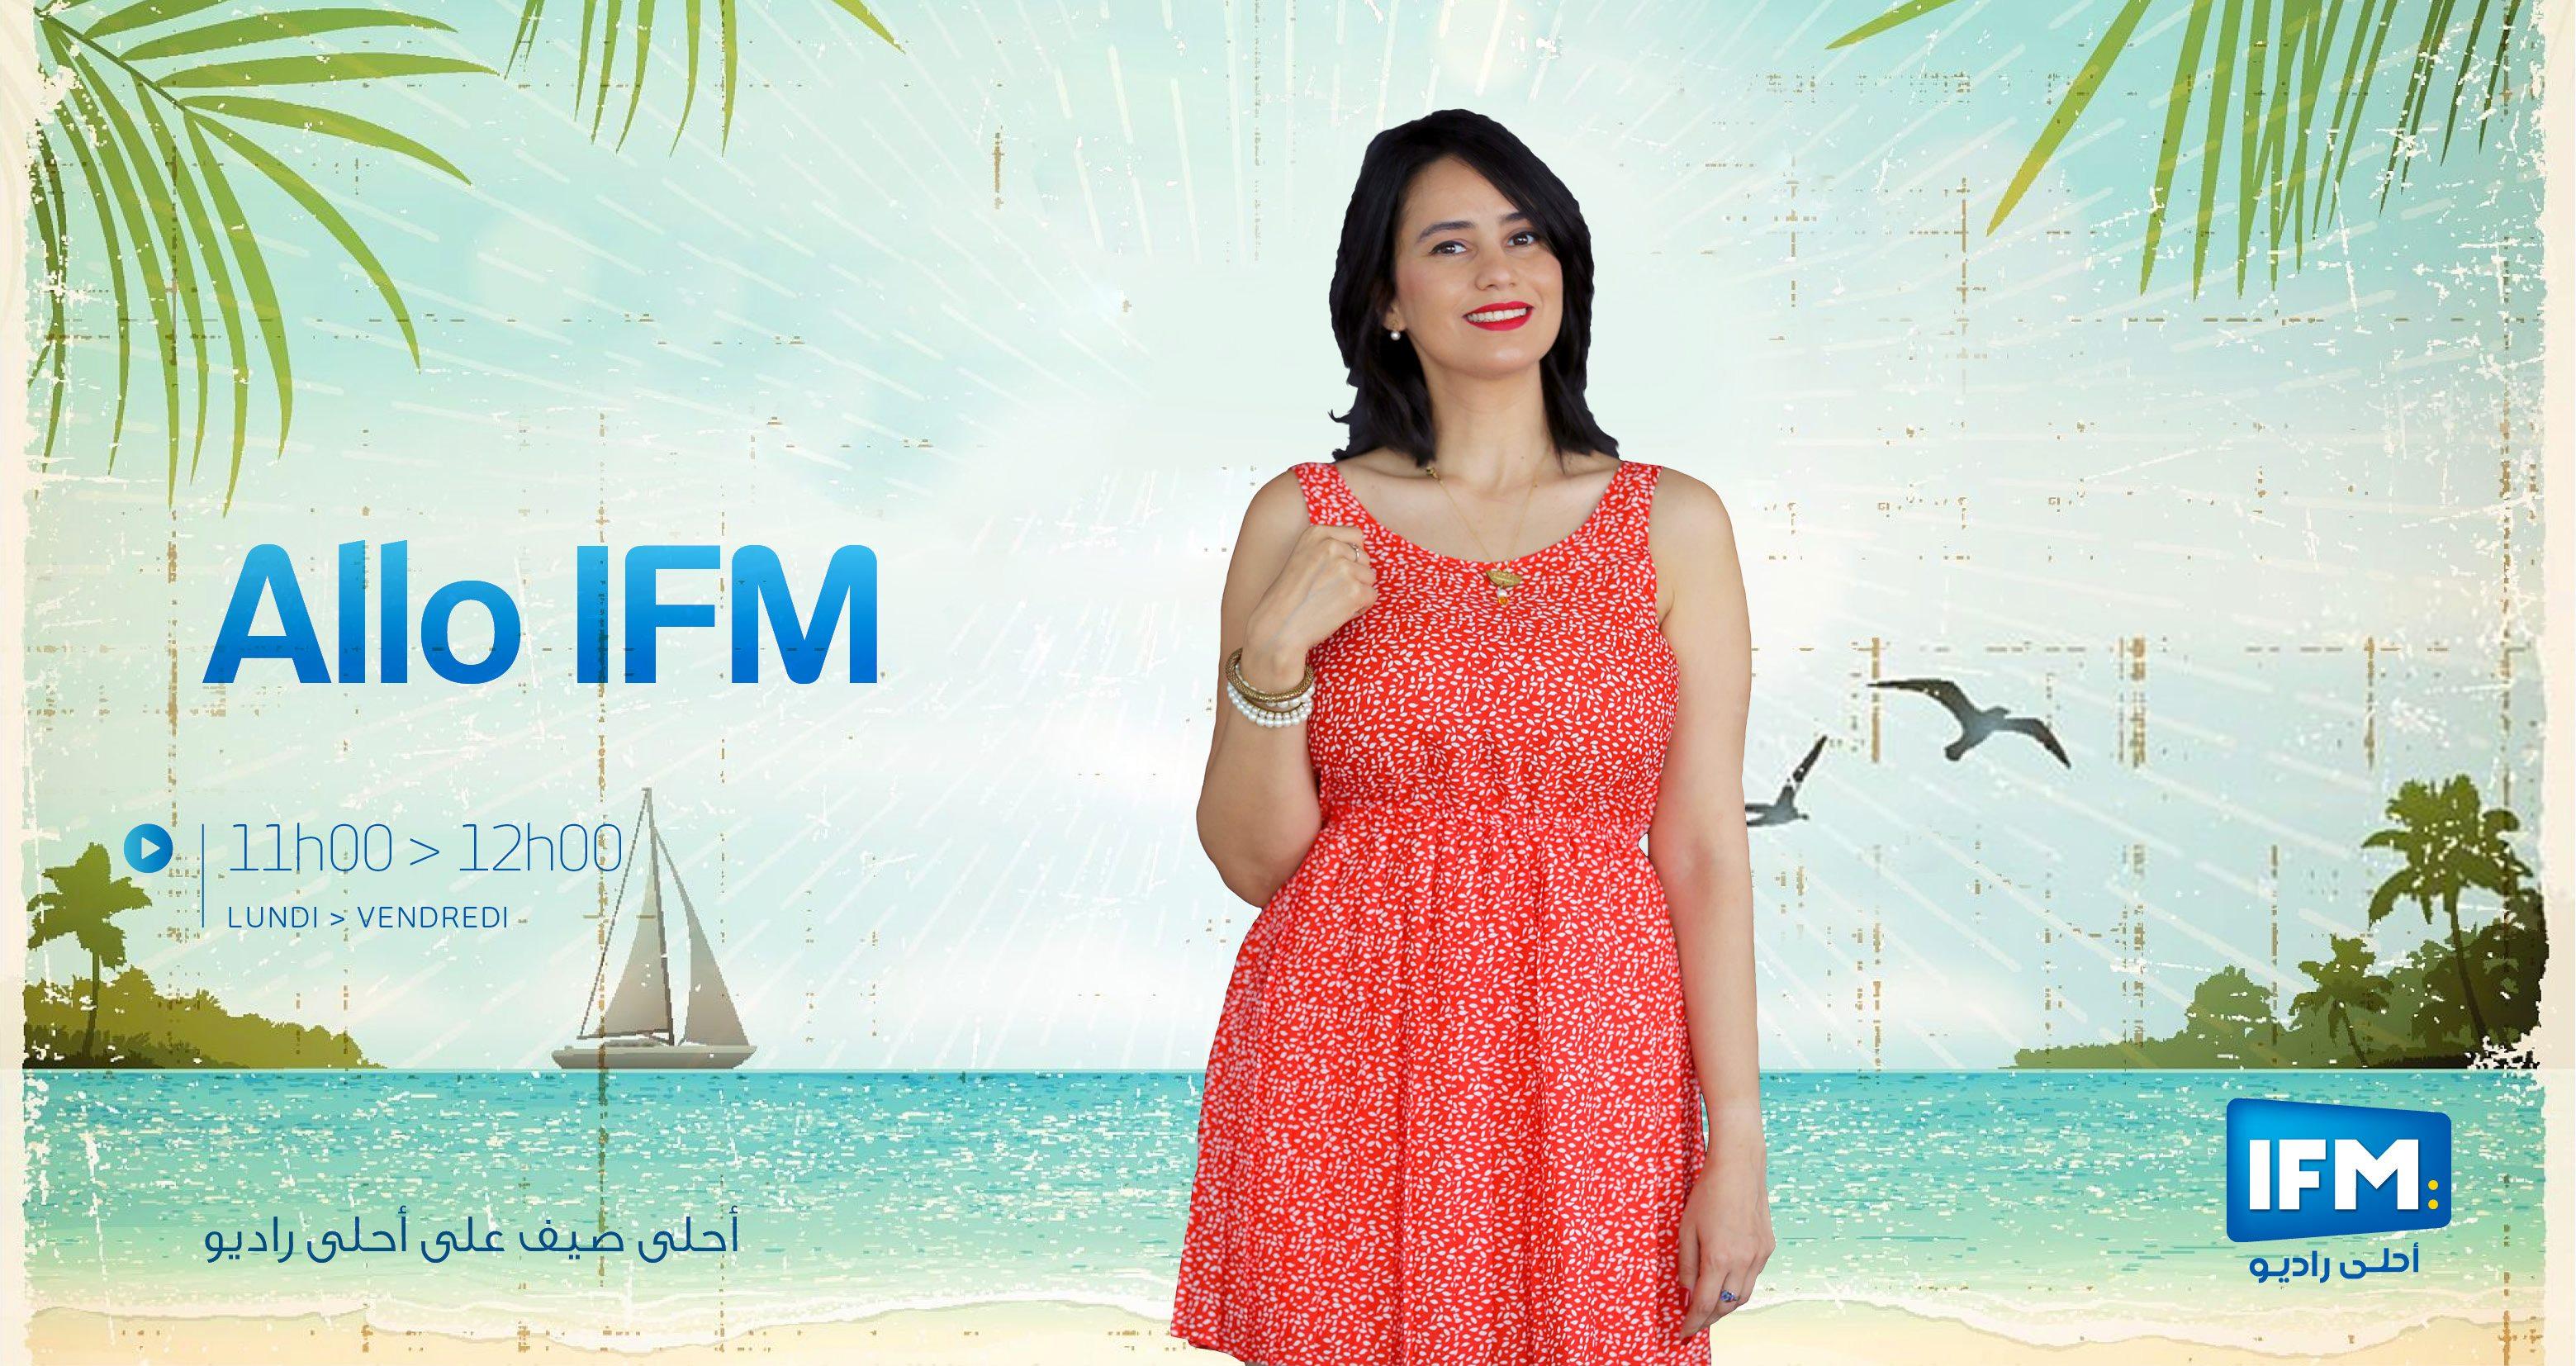 Allo IFM ألو IFM لنهار الإربعاء 12 أوت 2020